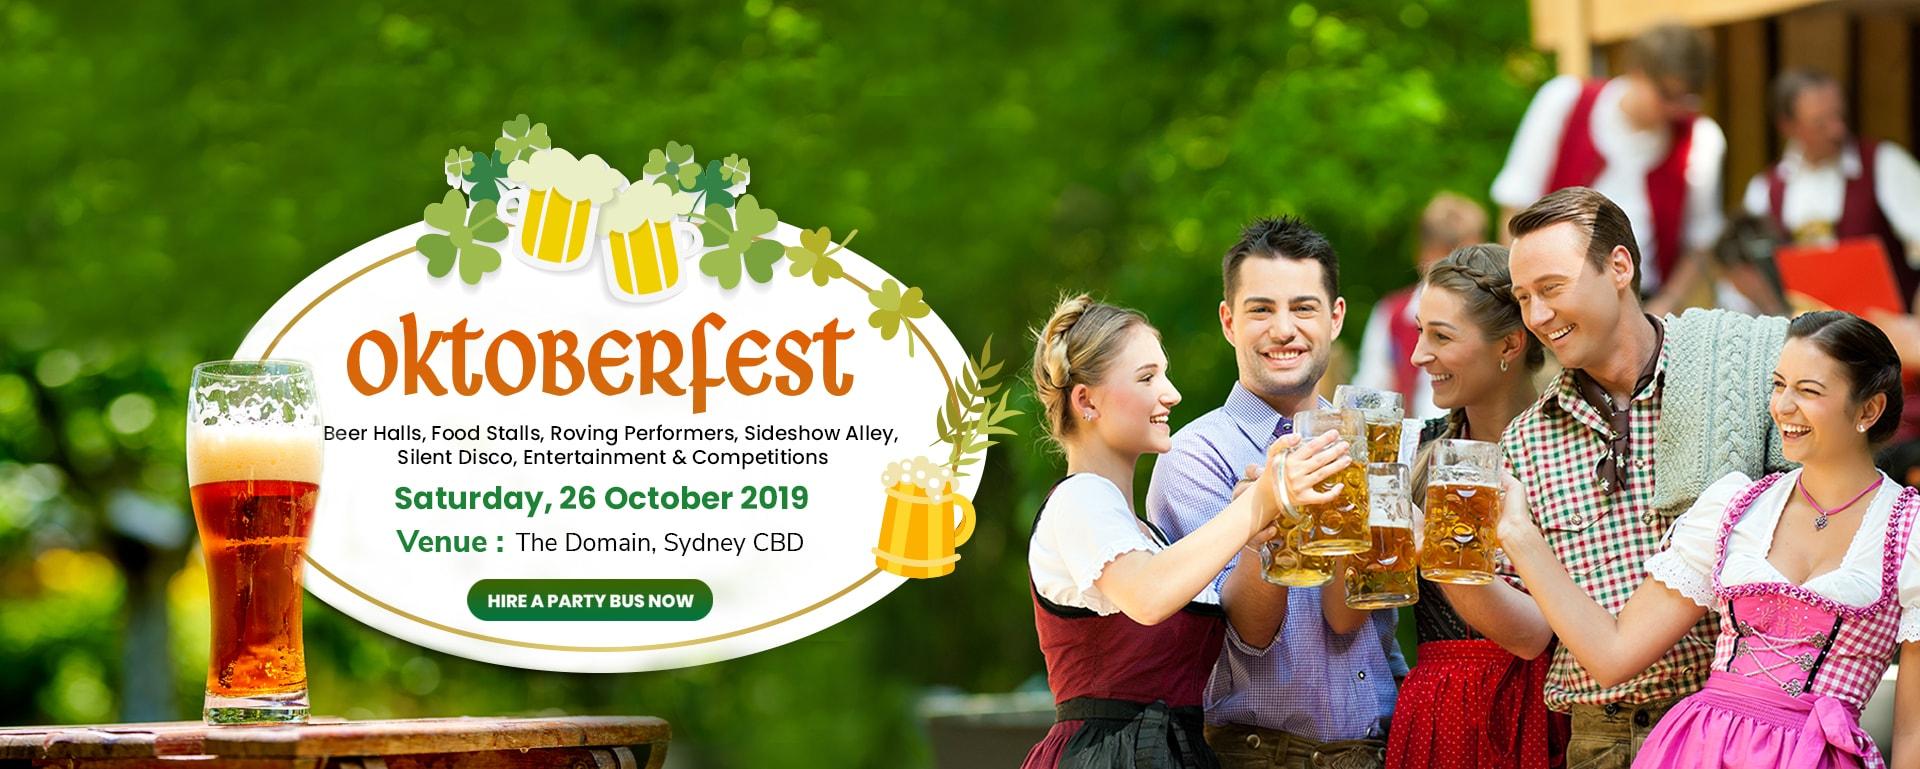 Hire a Party Bus for Oktoberfest Sydney 2019